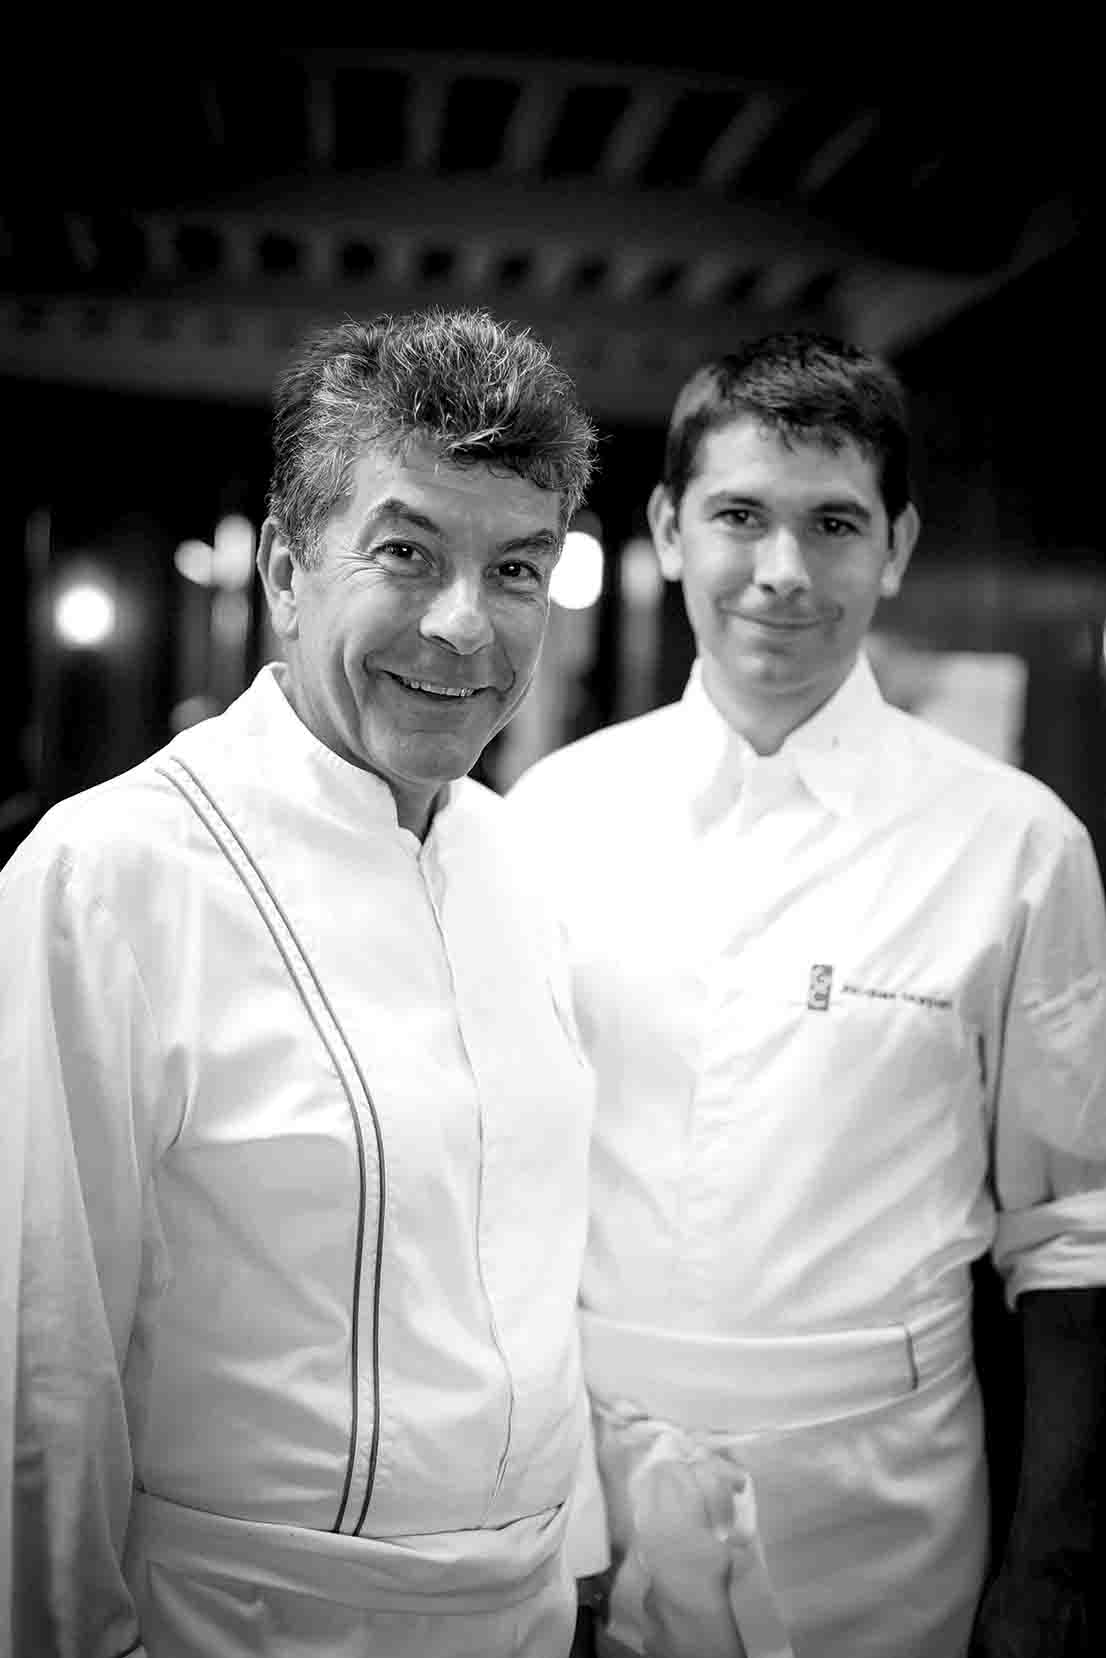 Régis e Jacques Marcon, fotografia di Philippe Barret